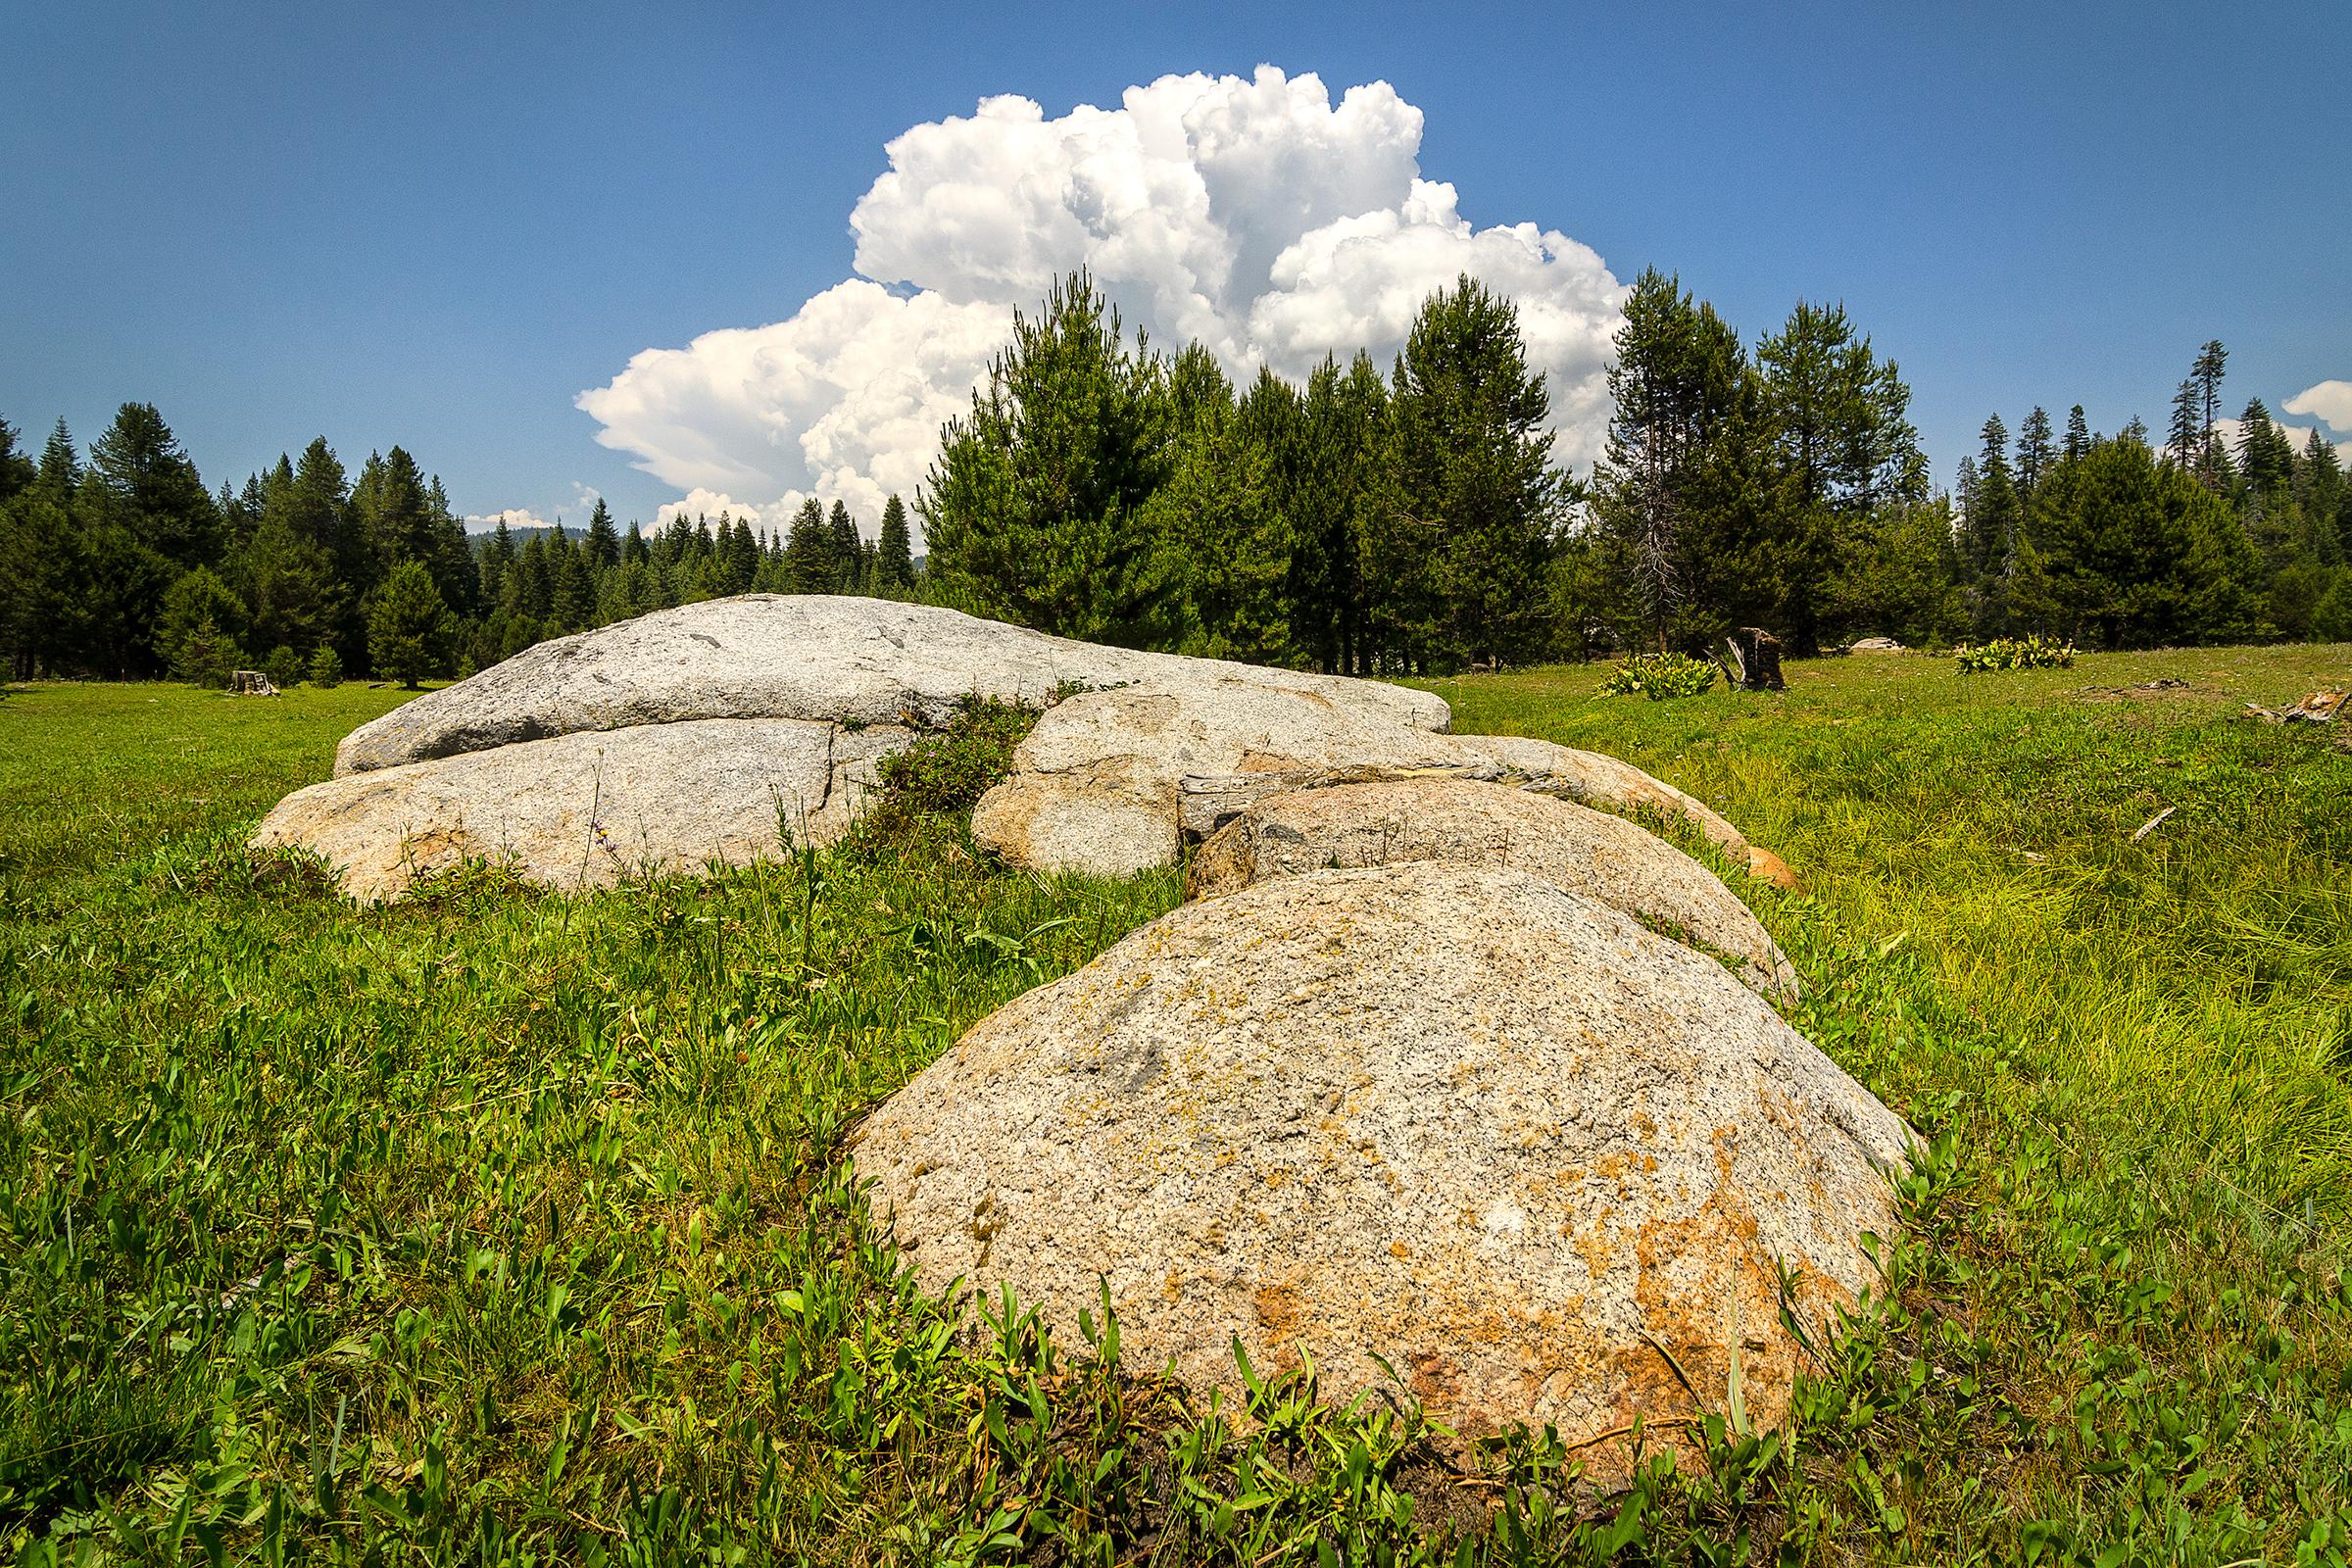 Yosemite National Forest, California. Sierra Nevada Mountains. Wasim Muklashy Photography